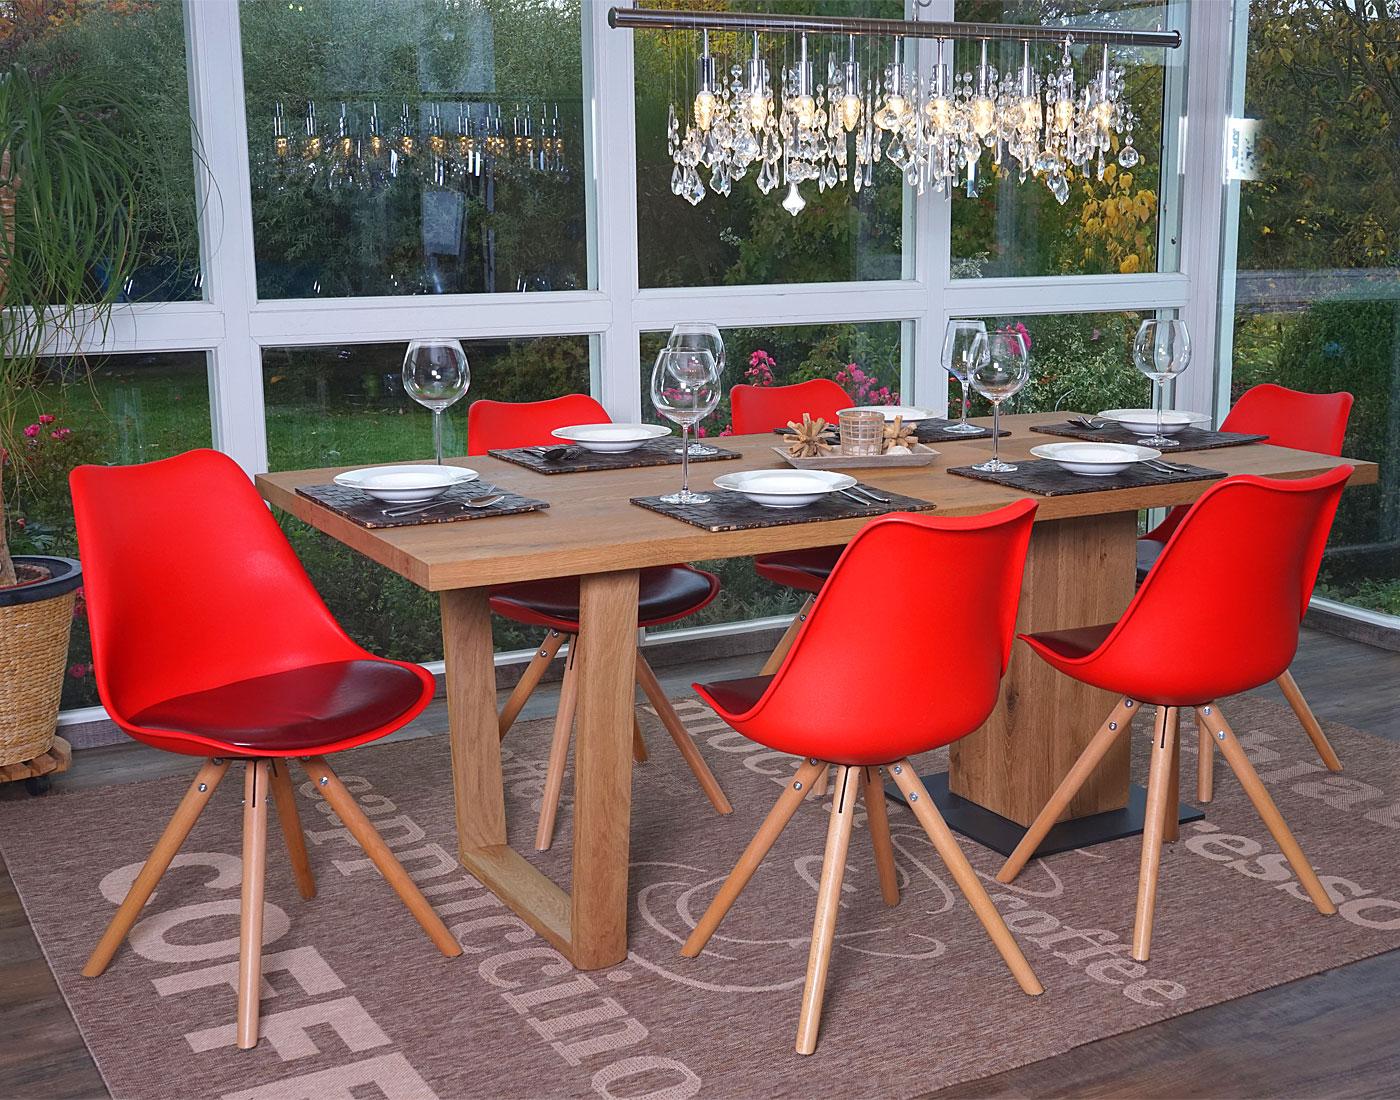 6x esszimmerstuhl malm stuhl rot sitzfl che kunstleder for Esszimmerstuhl rot